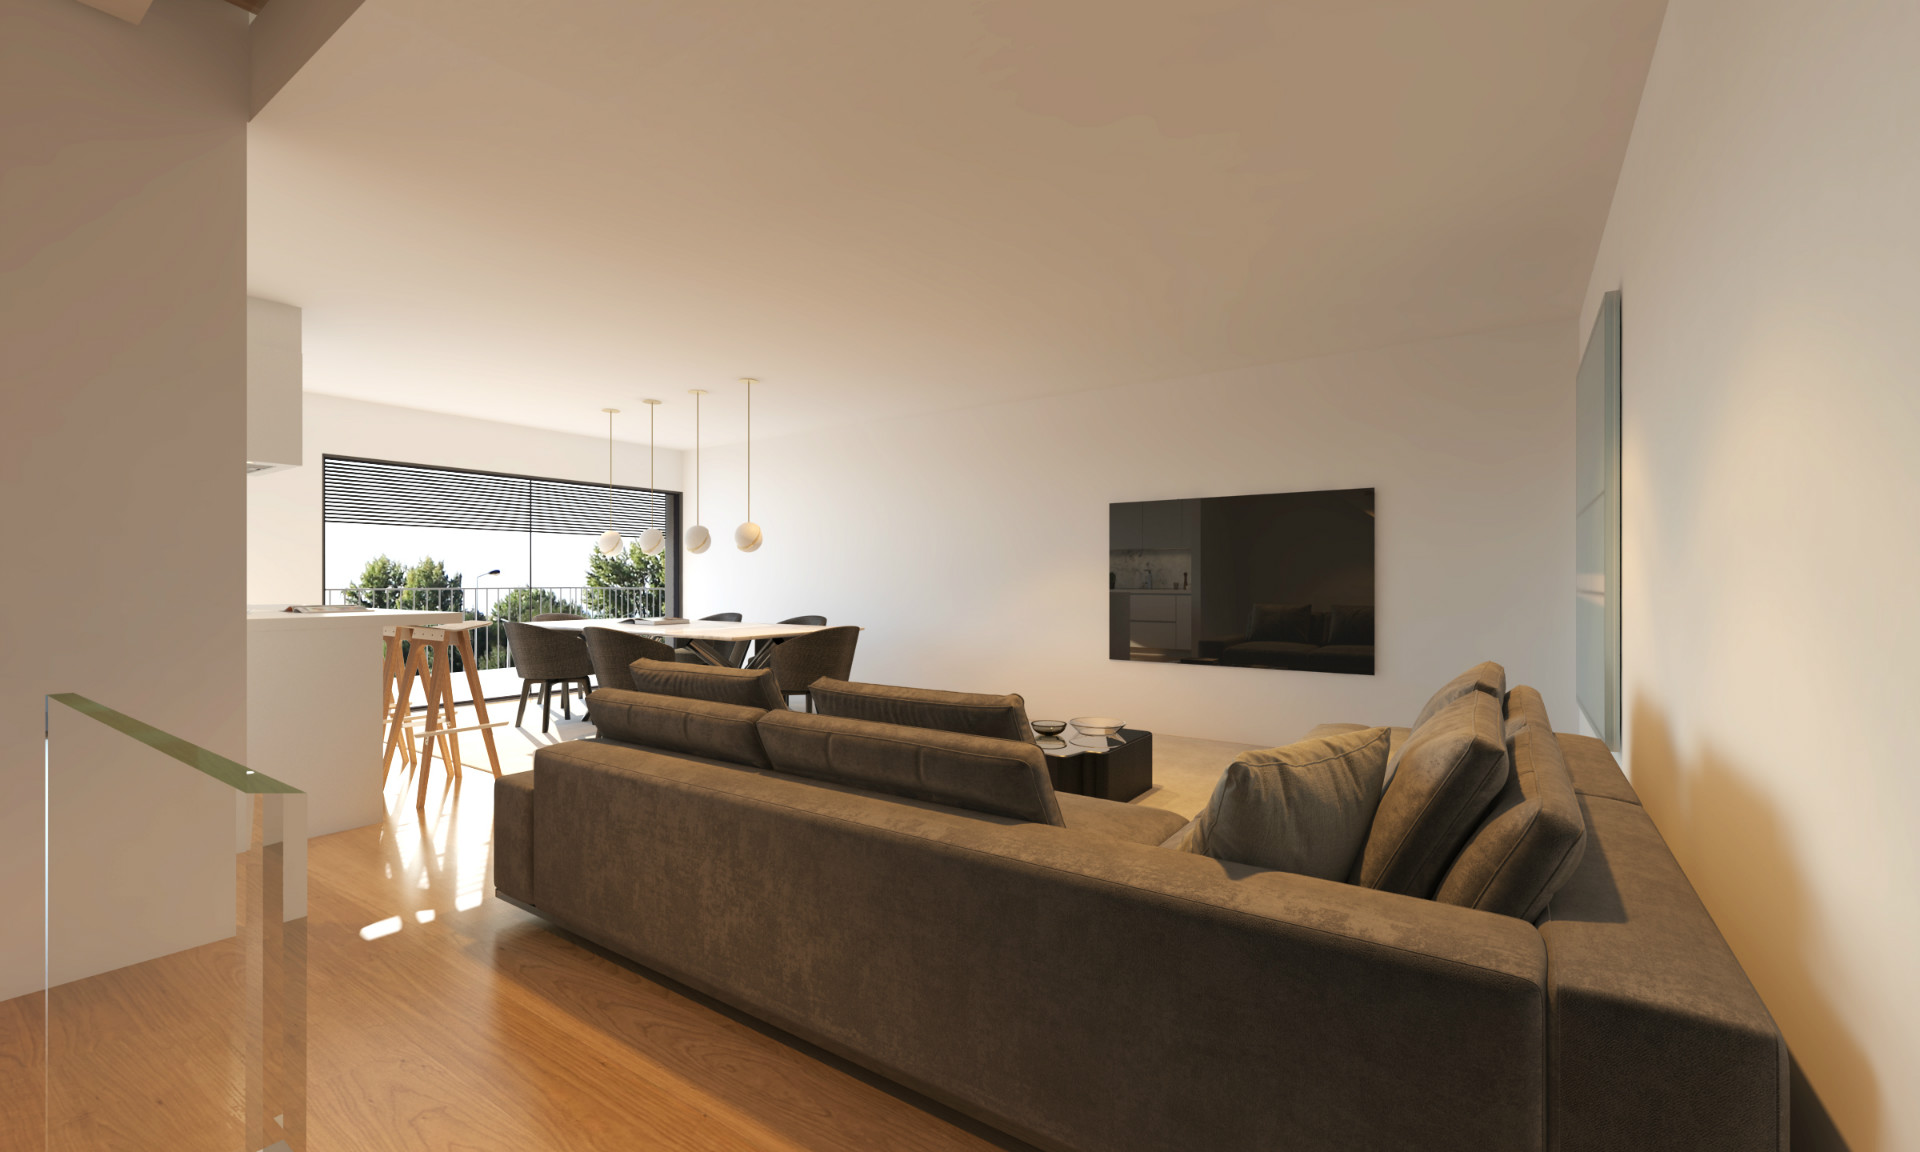 Arquitetura, Braga, Luxo, Qualidade,T4, Churrasqueira